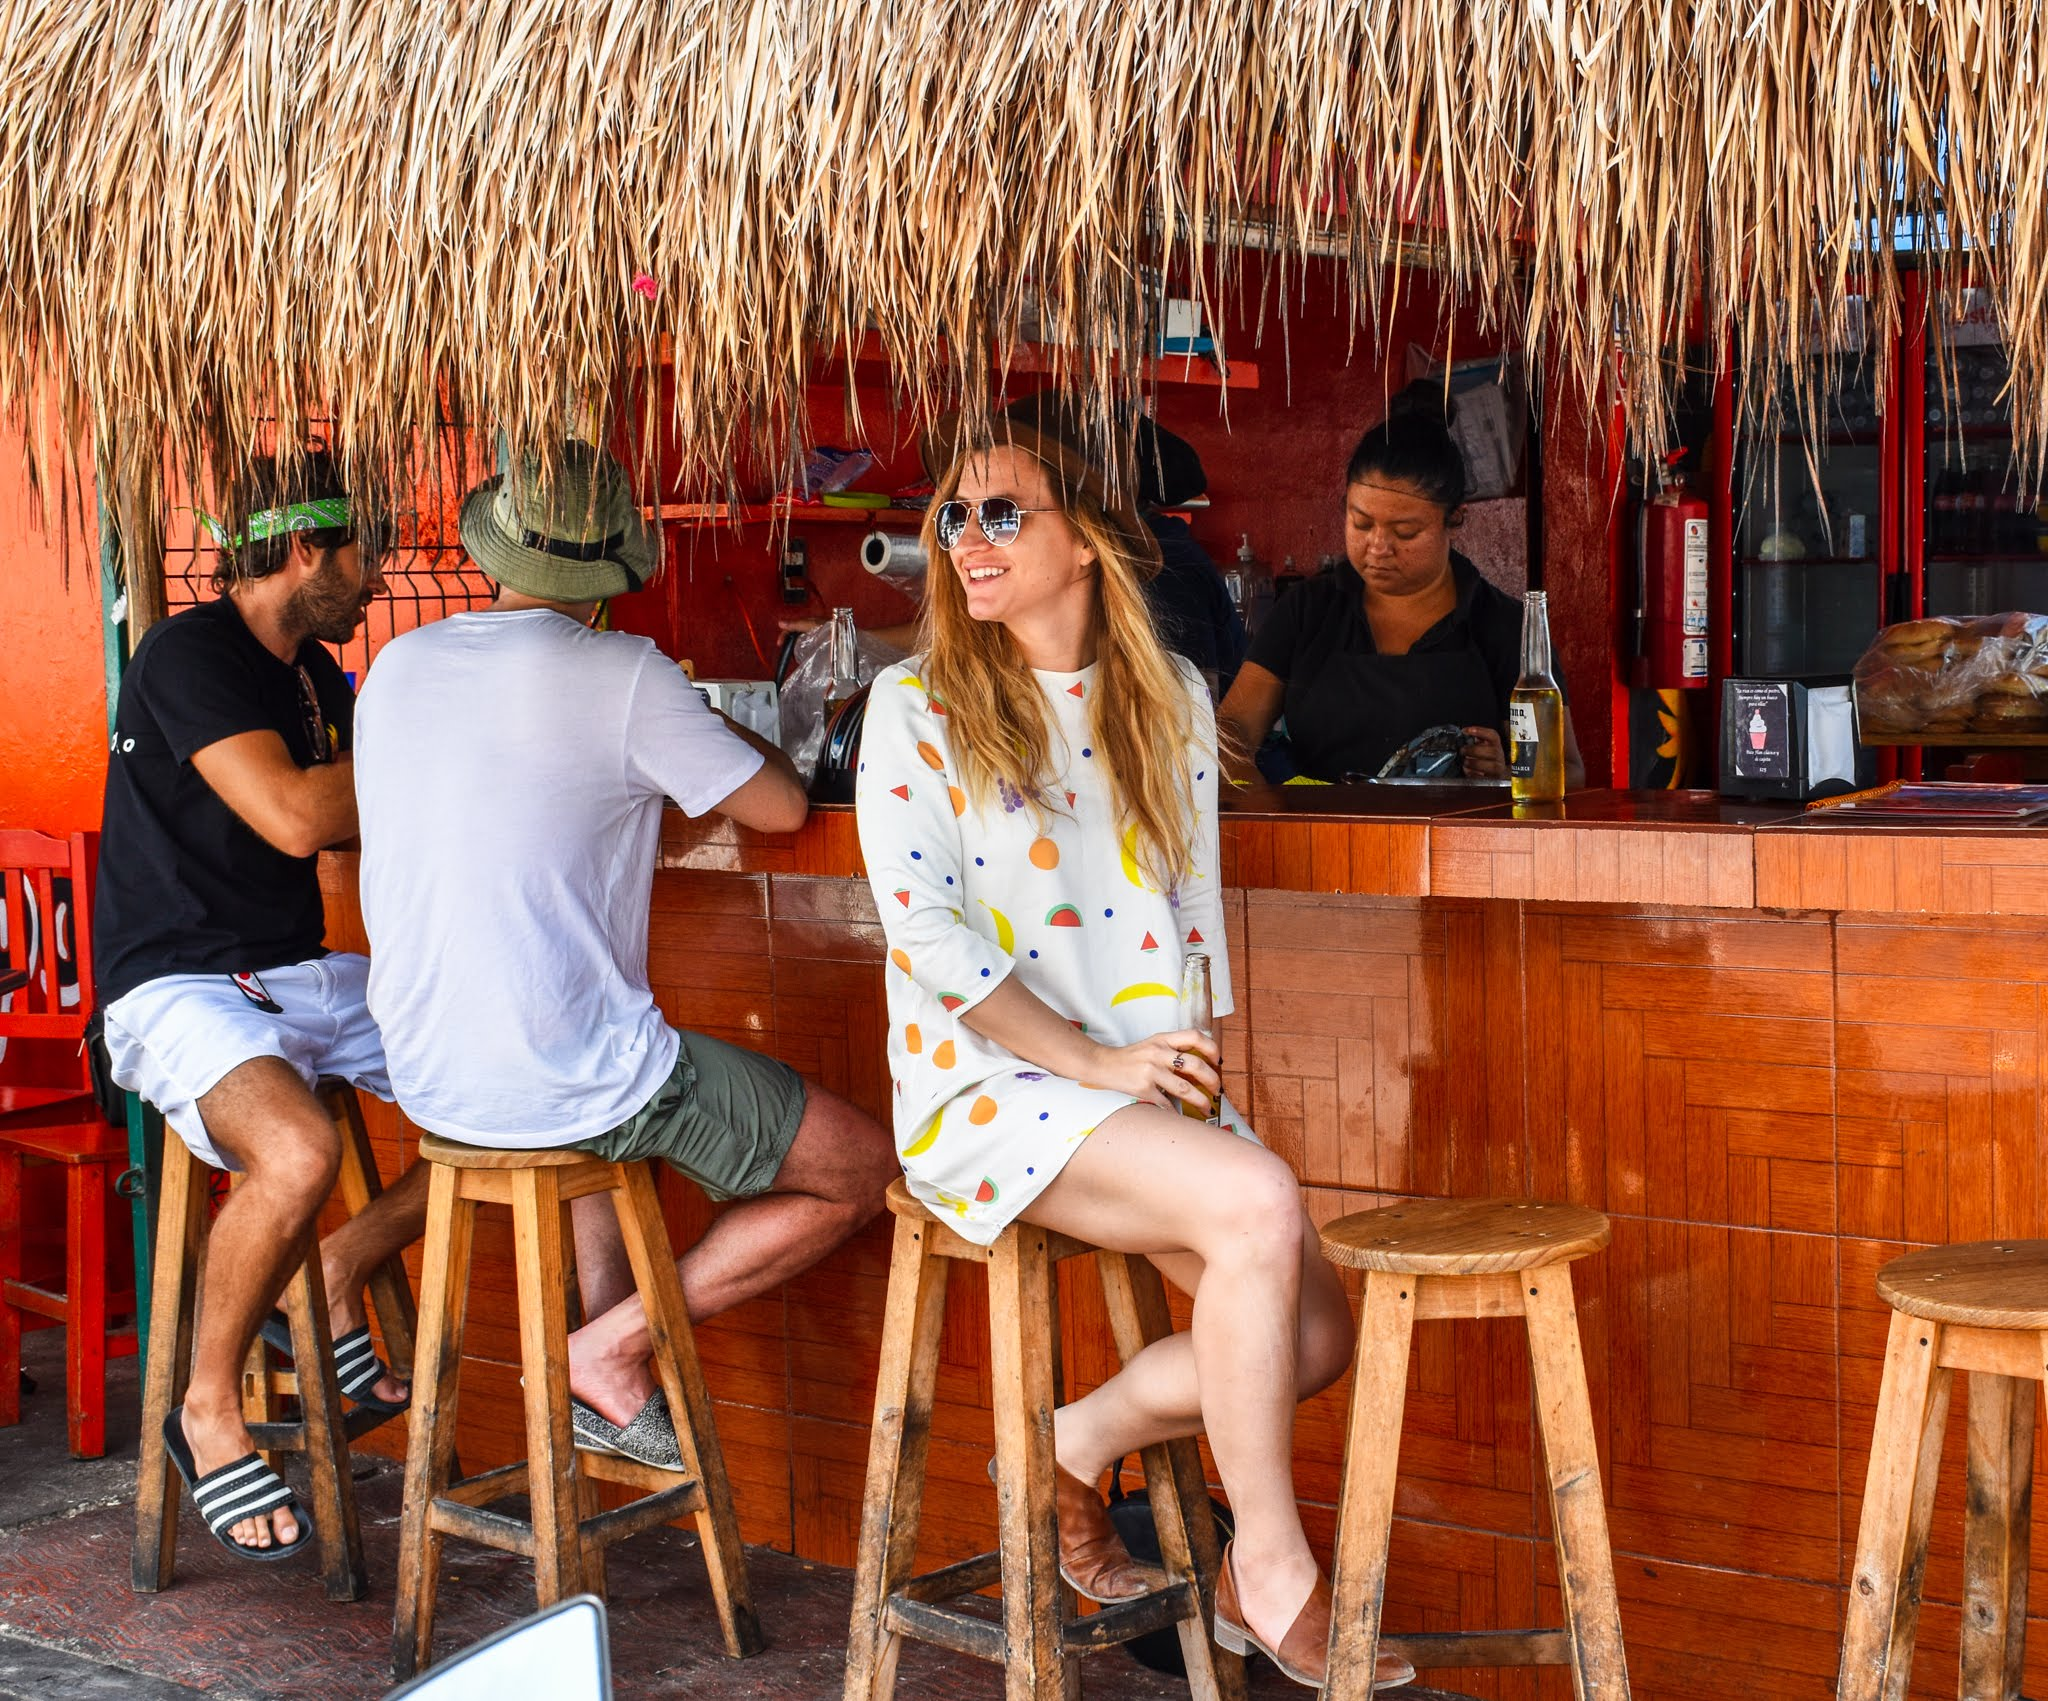 Uprooted-Traveler-Vegan-Weekend-in-Tulum-Mexico-Antojitos-La-Chiapaneca-bar.jpg